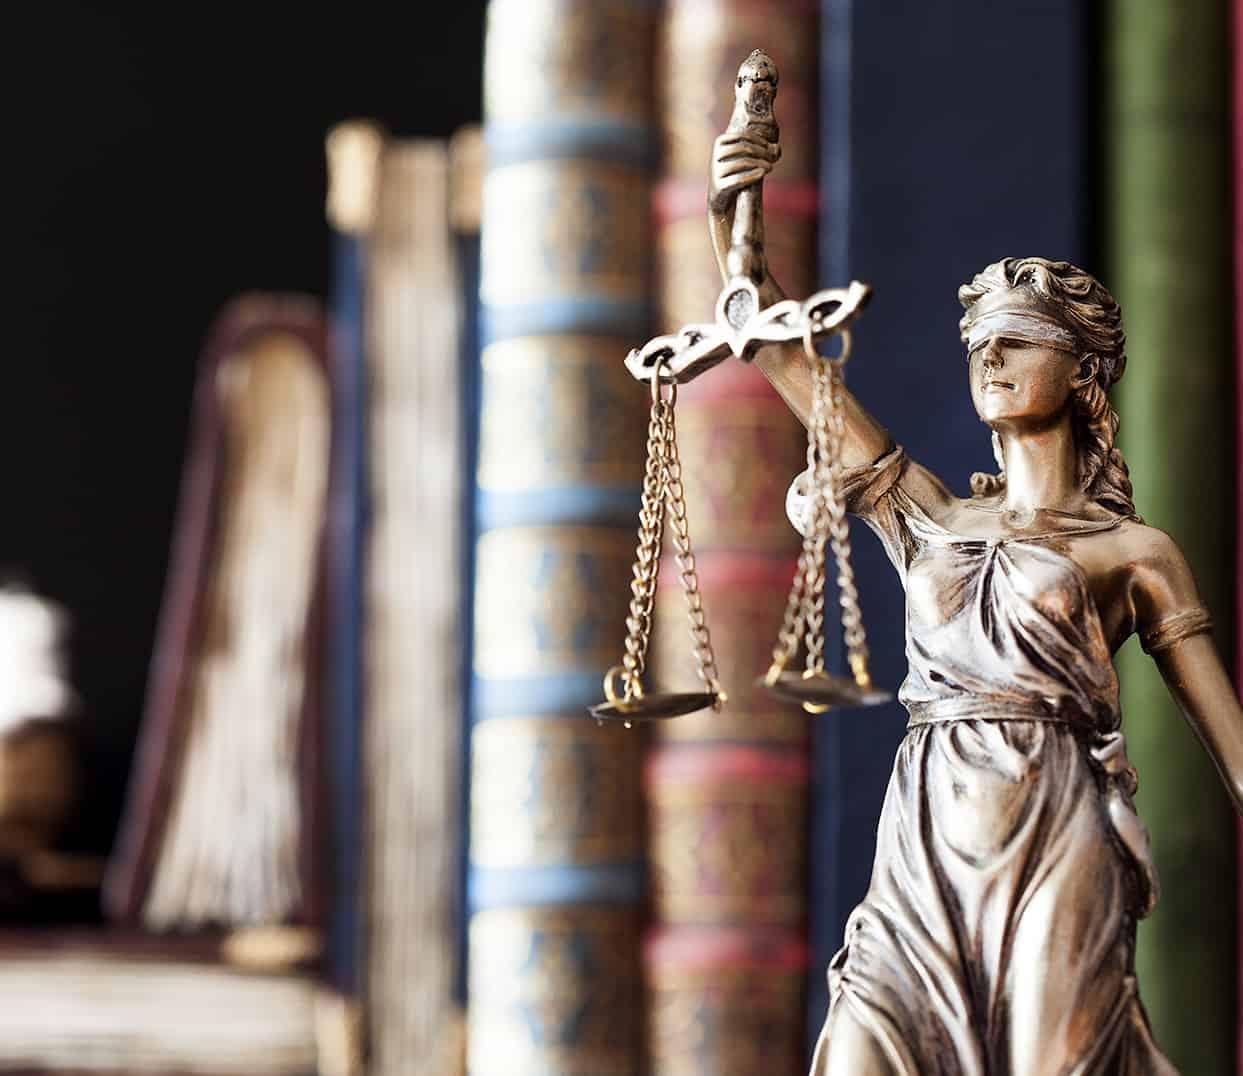 palm beach county court liaison